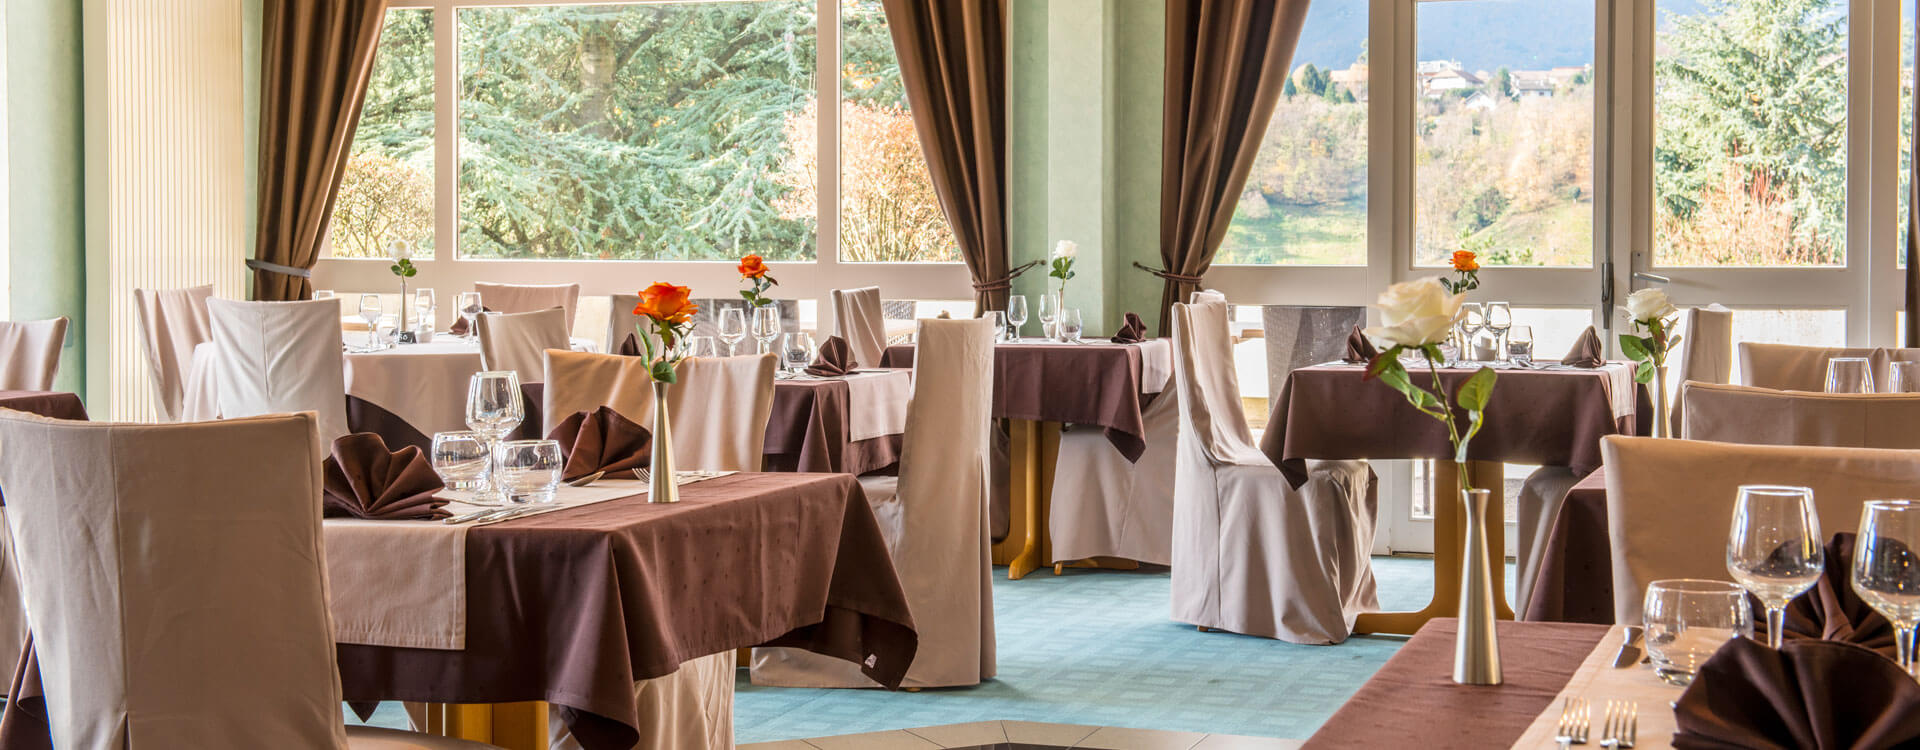 Evénements privés - Hôtel & spa*** La Villa Marlioz à Aix-les-Bains